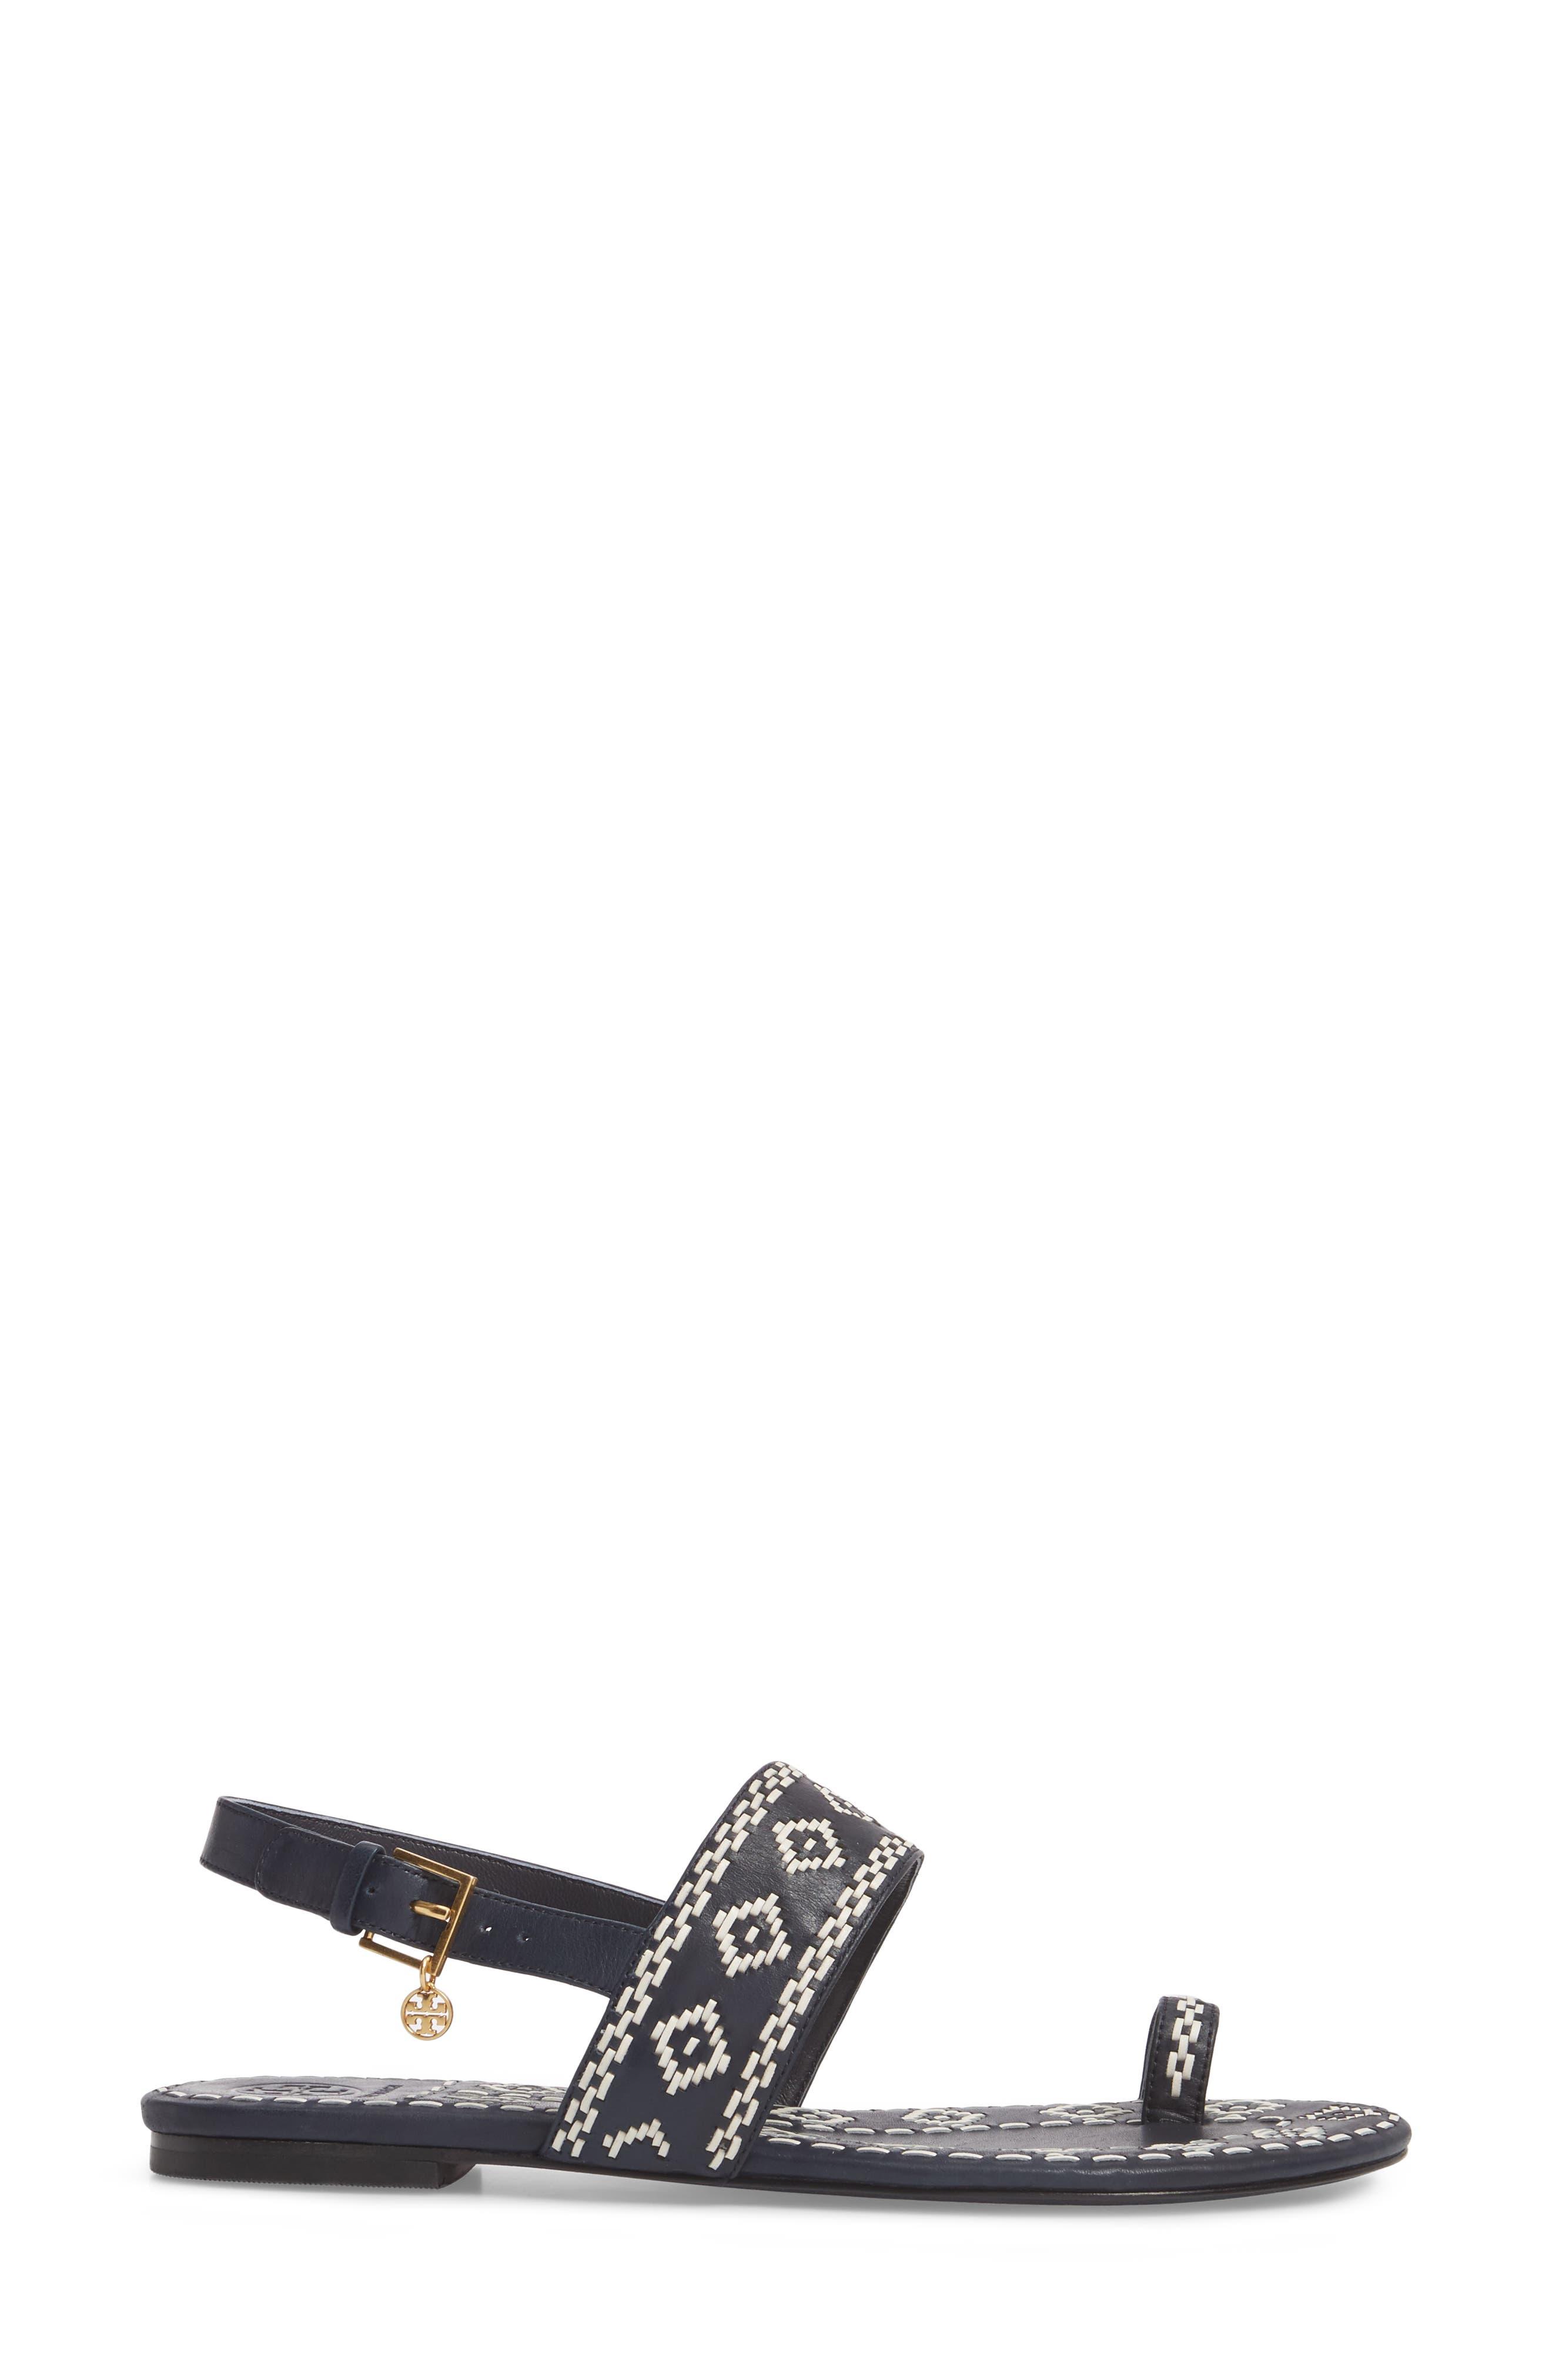 Blake Toe Loop Slingback Sandal,                             Alternate thumbnail 3, color,                             Perfect Navy/ Perfect Ivory